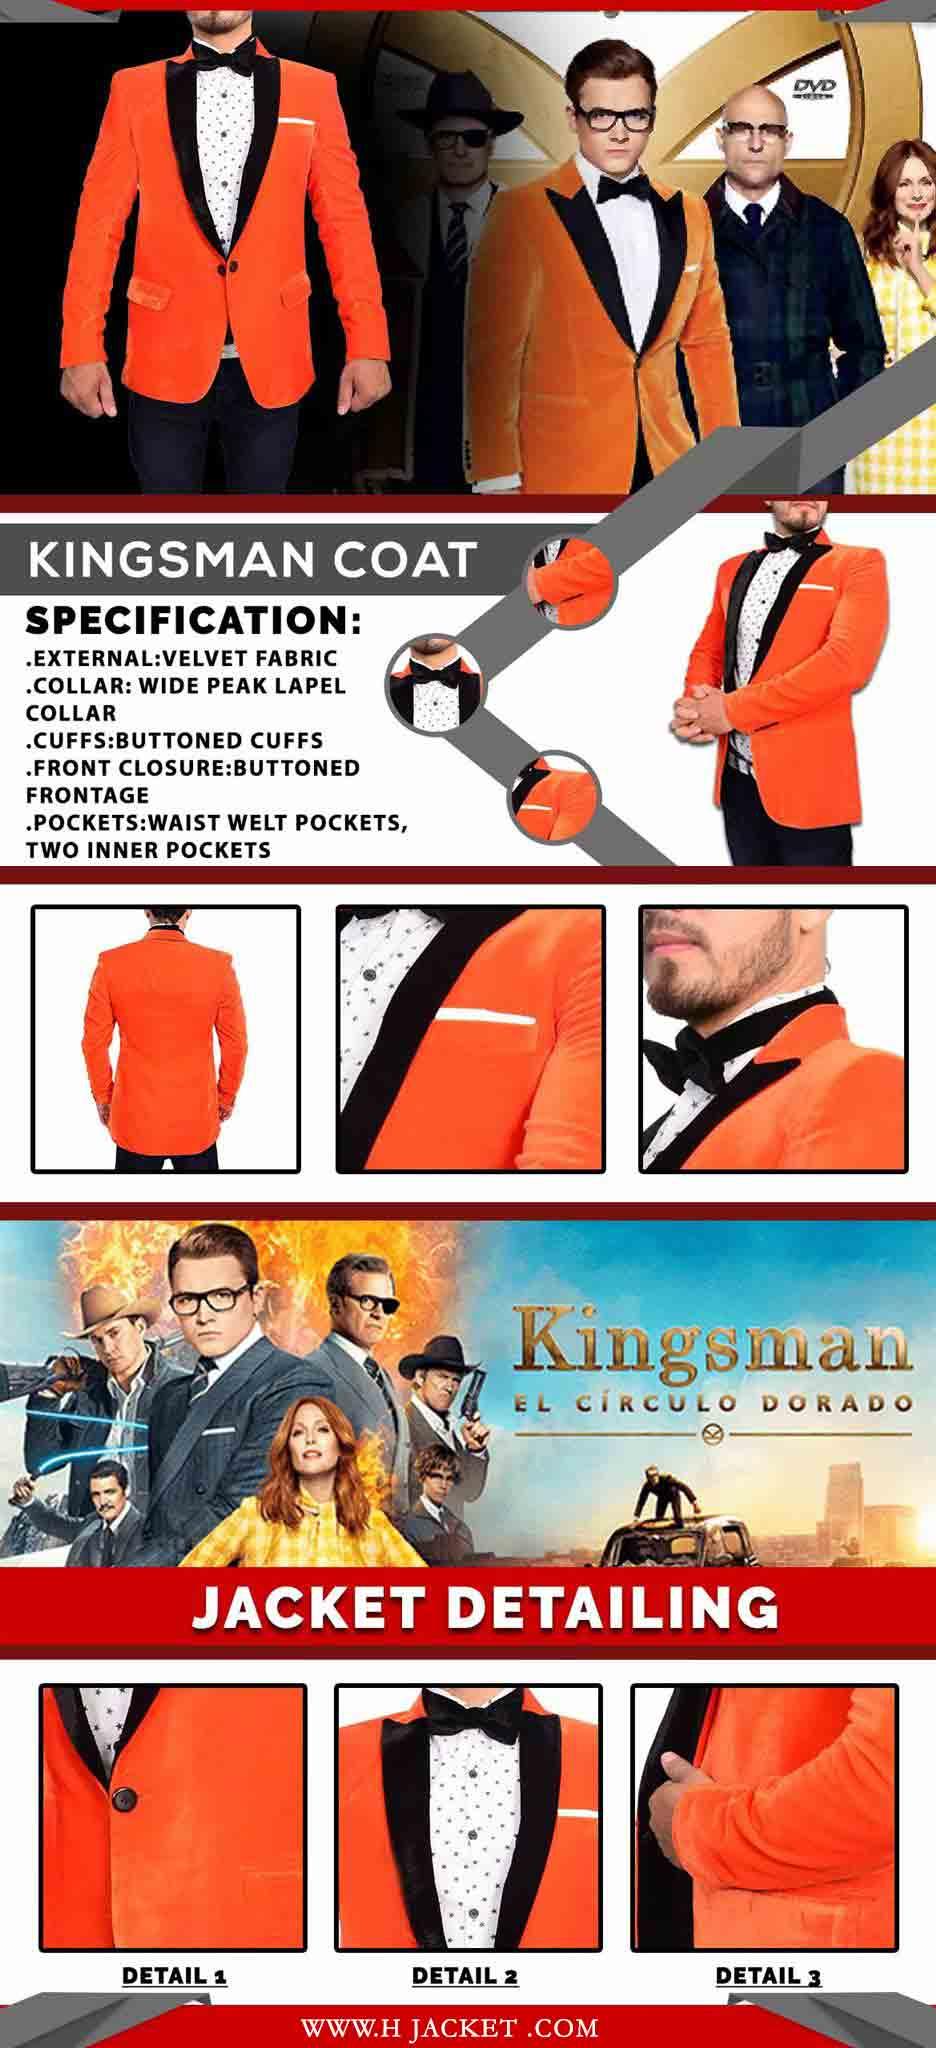 kinsman-coat